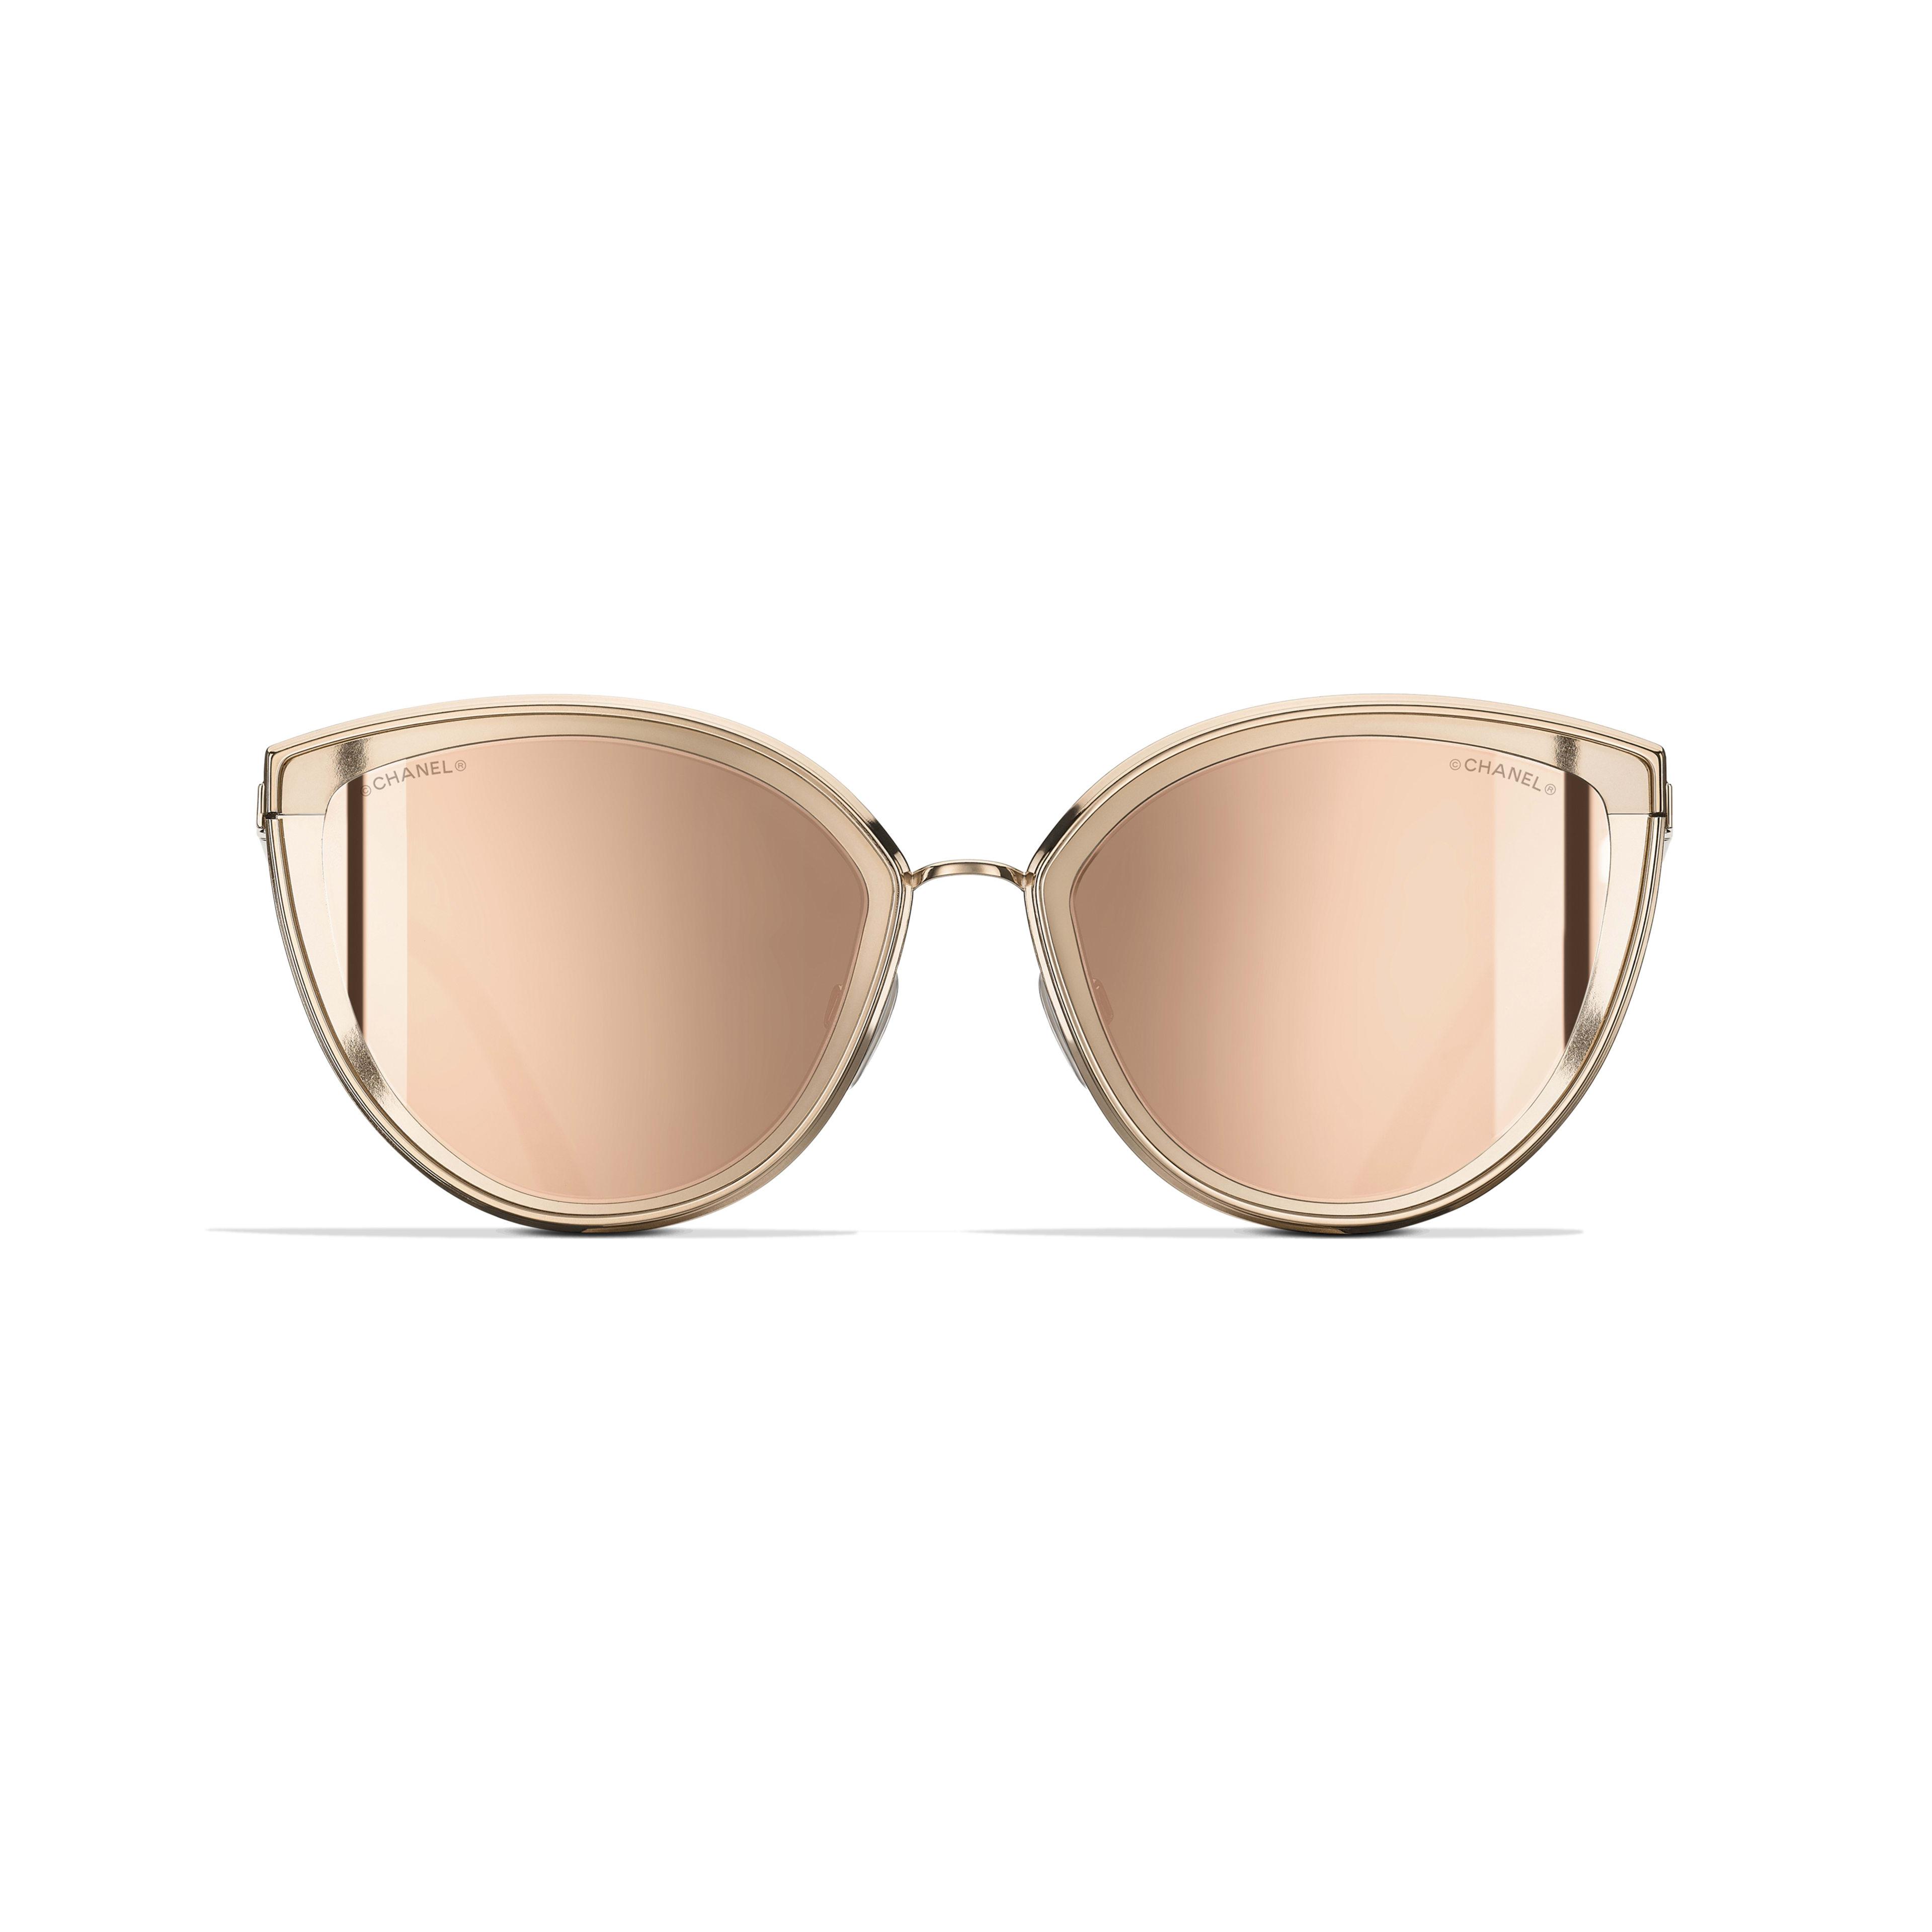 ac68cfbc6bd ... Cat Eye Sunglasses - Pink Gold - Metal - 18-Karat Gold Lenses -  Alternative